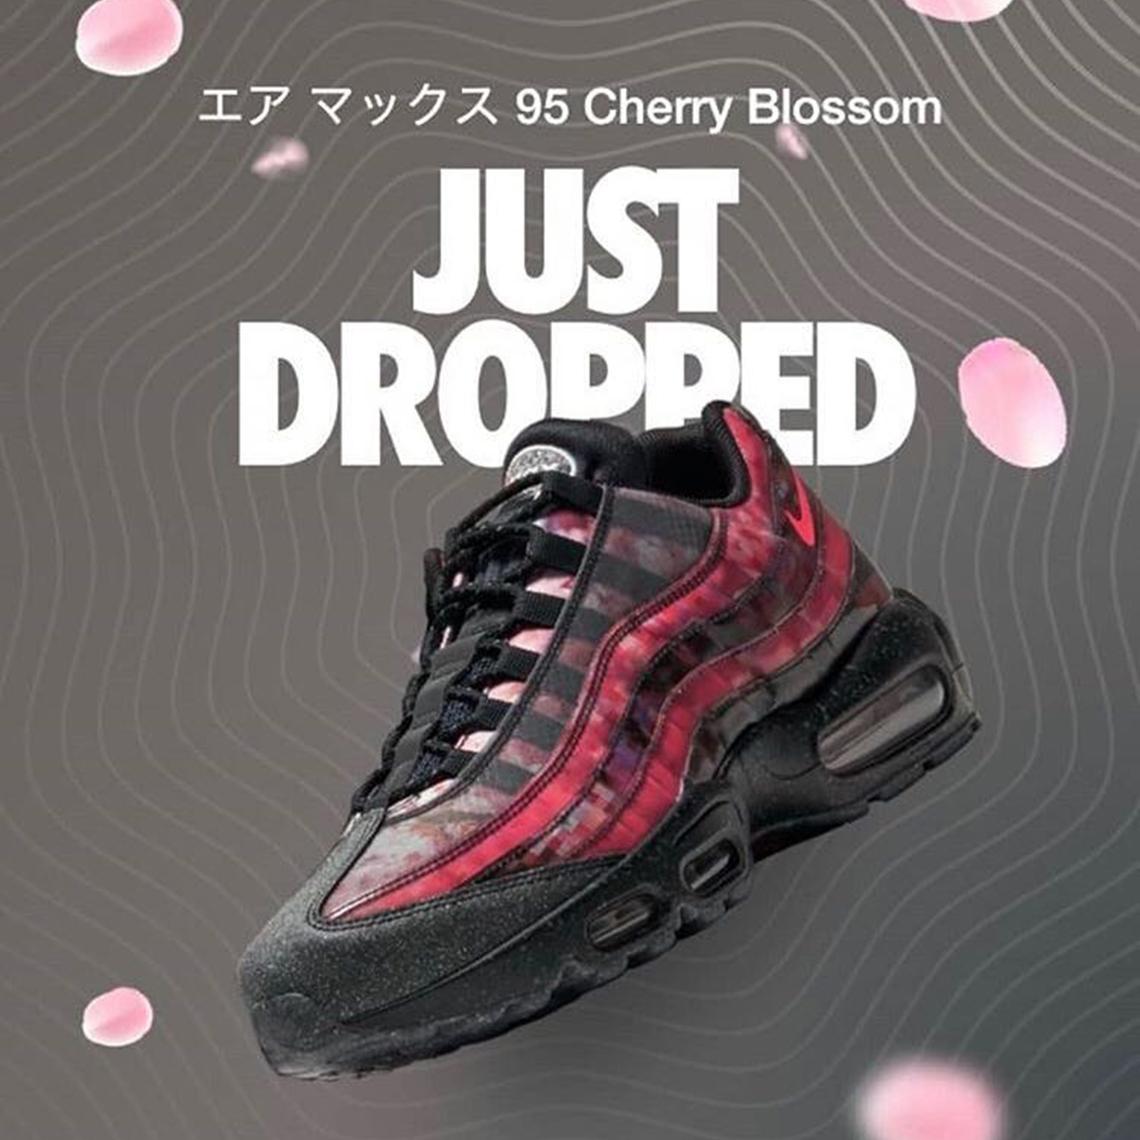 Nike Air Max 95 Cherry Blossom CU6723 076 |